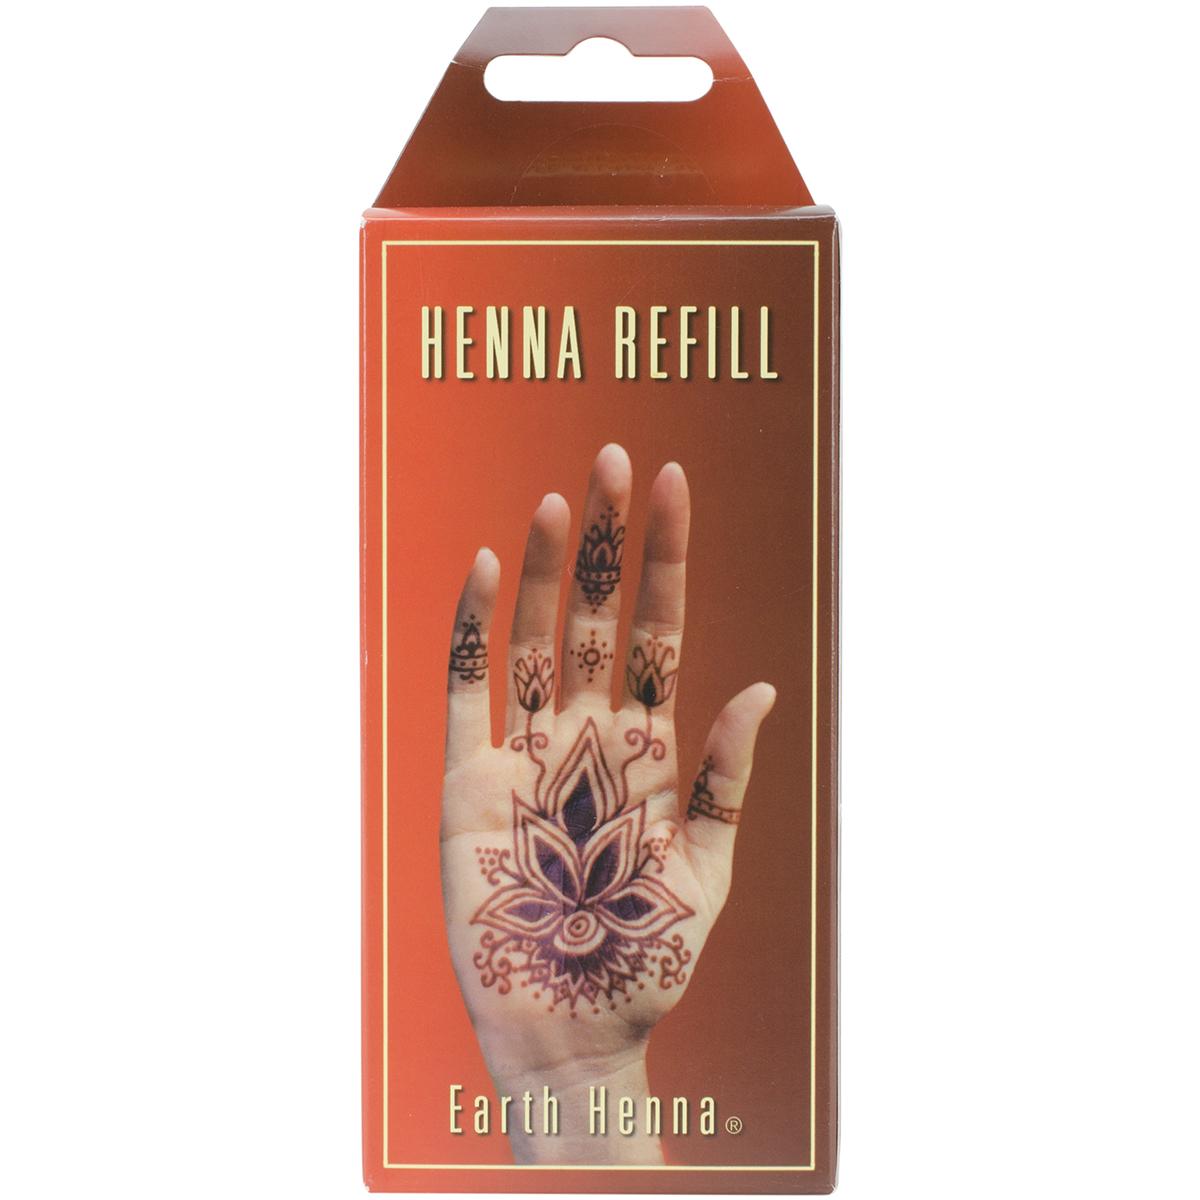 Earth Henna Body Painting Kit Refill-Orange